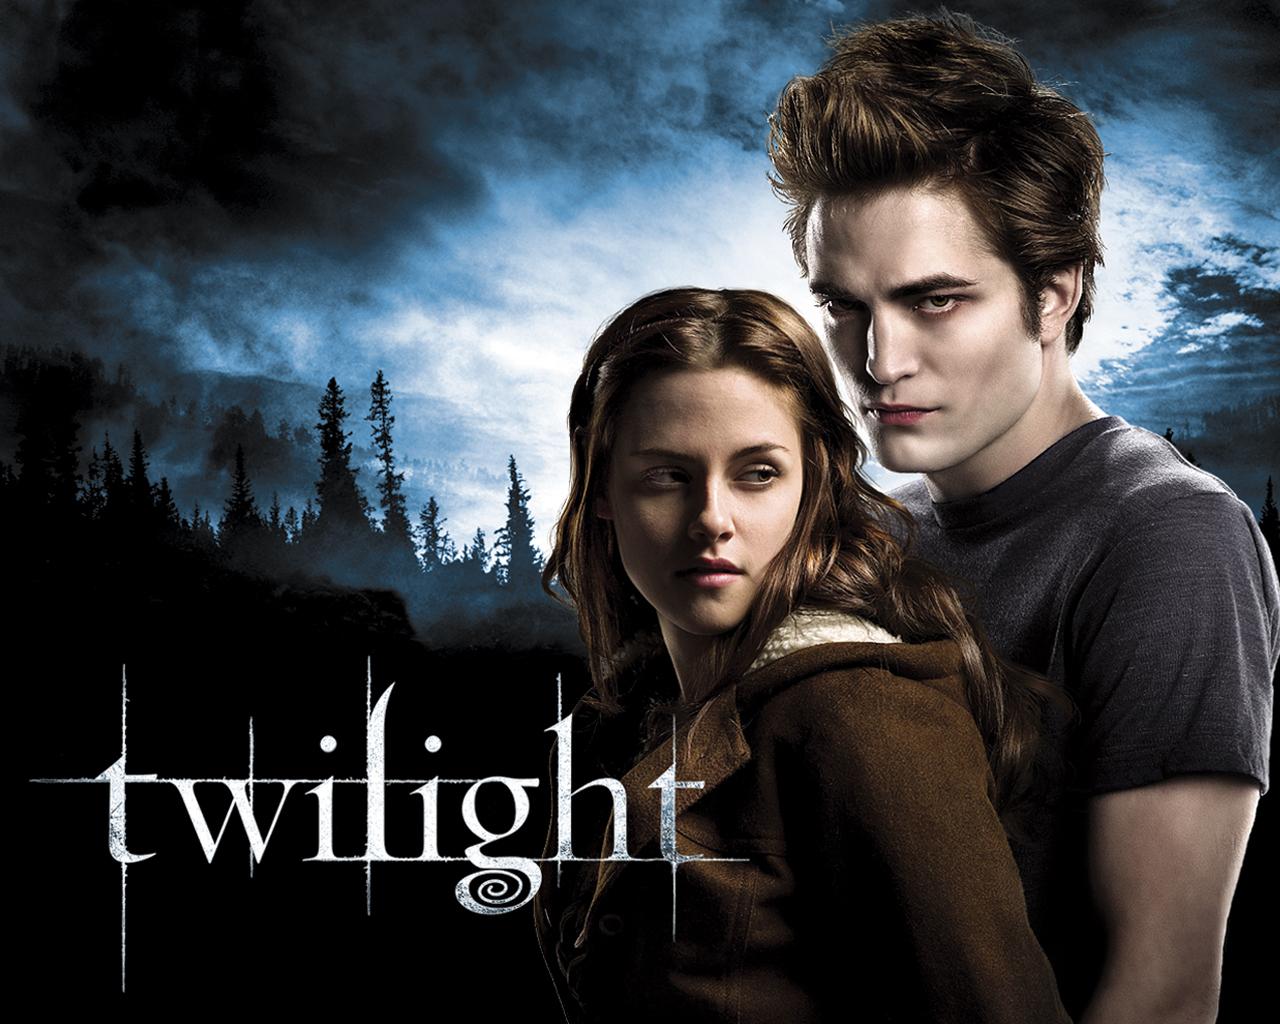 twilight movies maniac